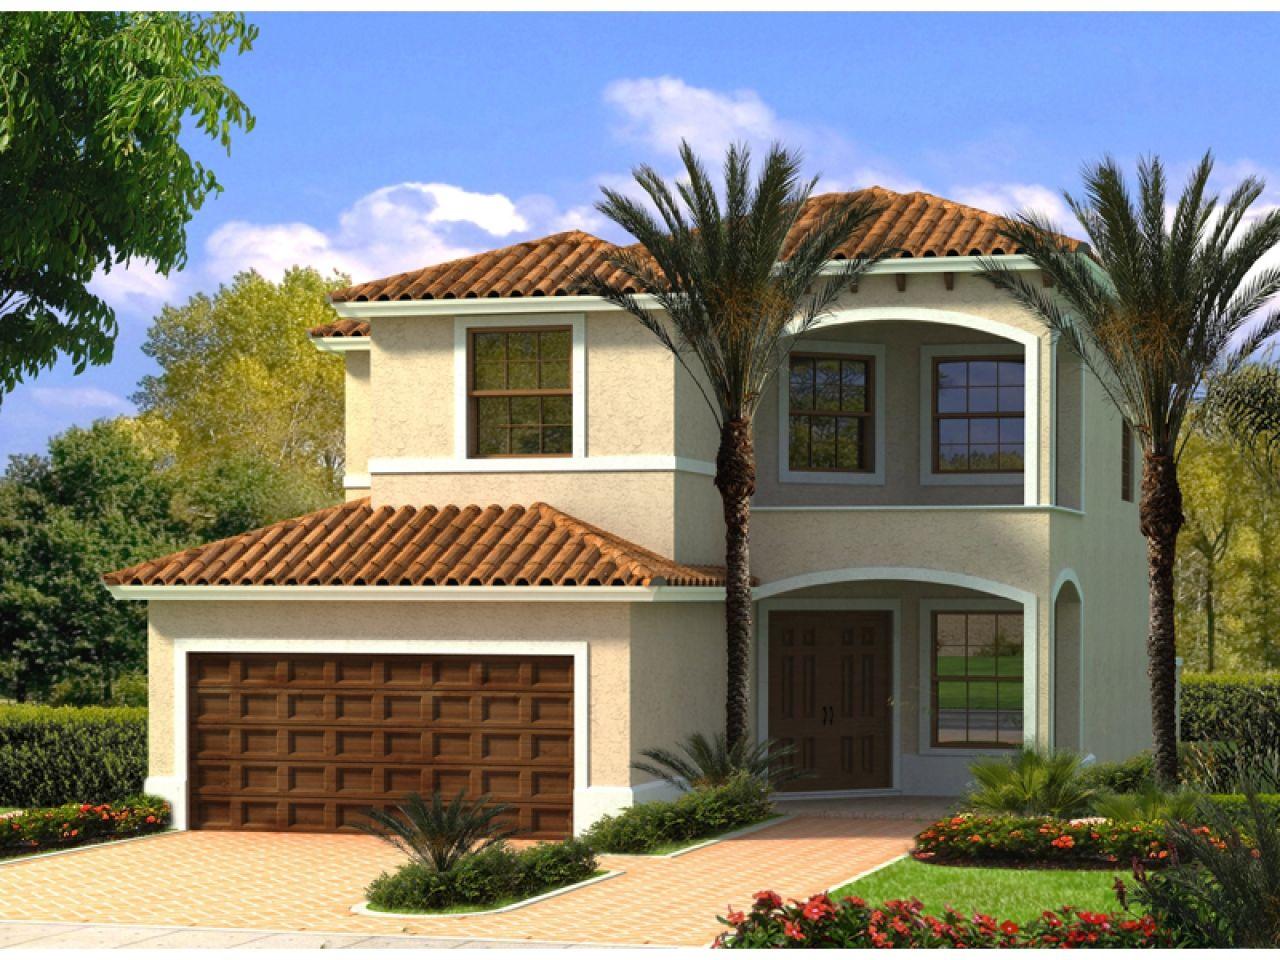 Small Beach House Floor Plans Simple Tropical Lrg Key West Style Florida Homes Friv Gaya Arsitektur Arsitektur Rumah Modern